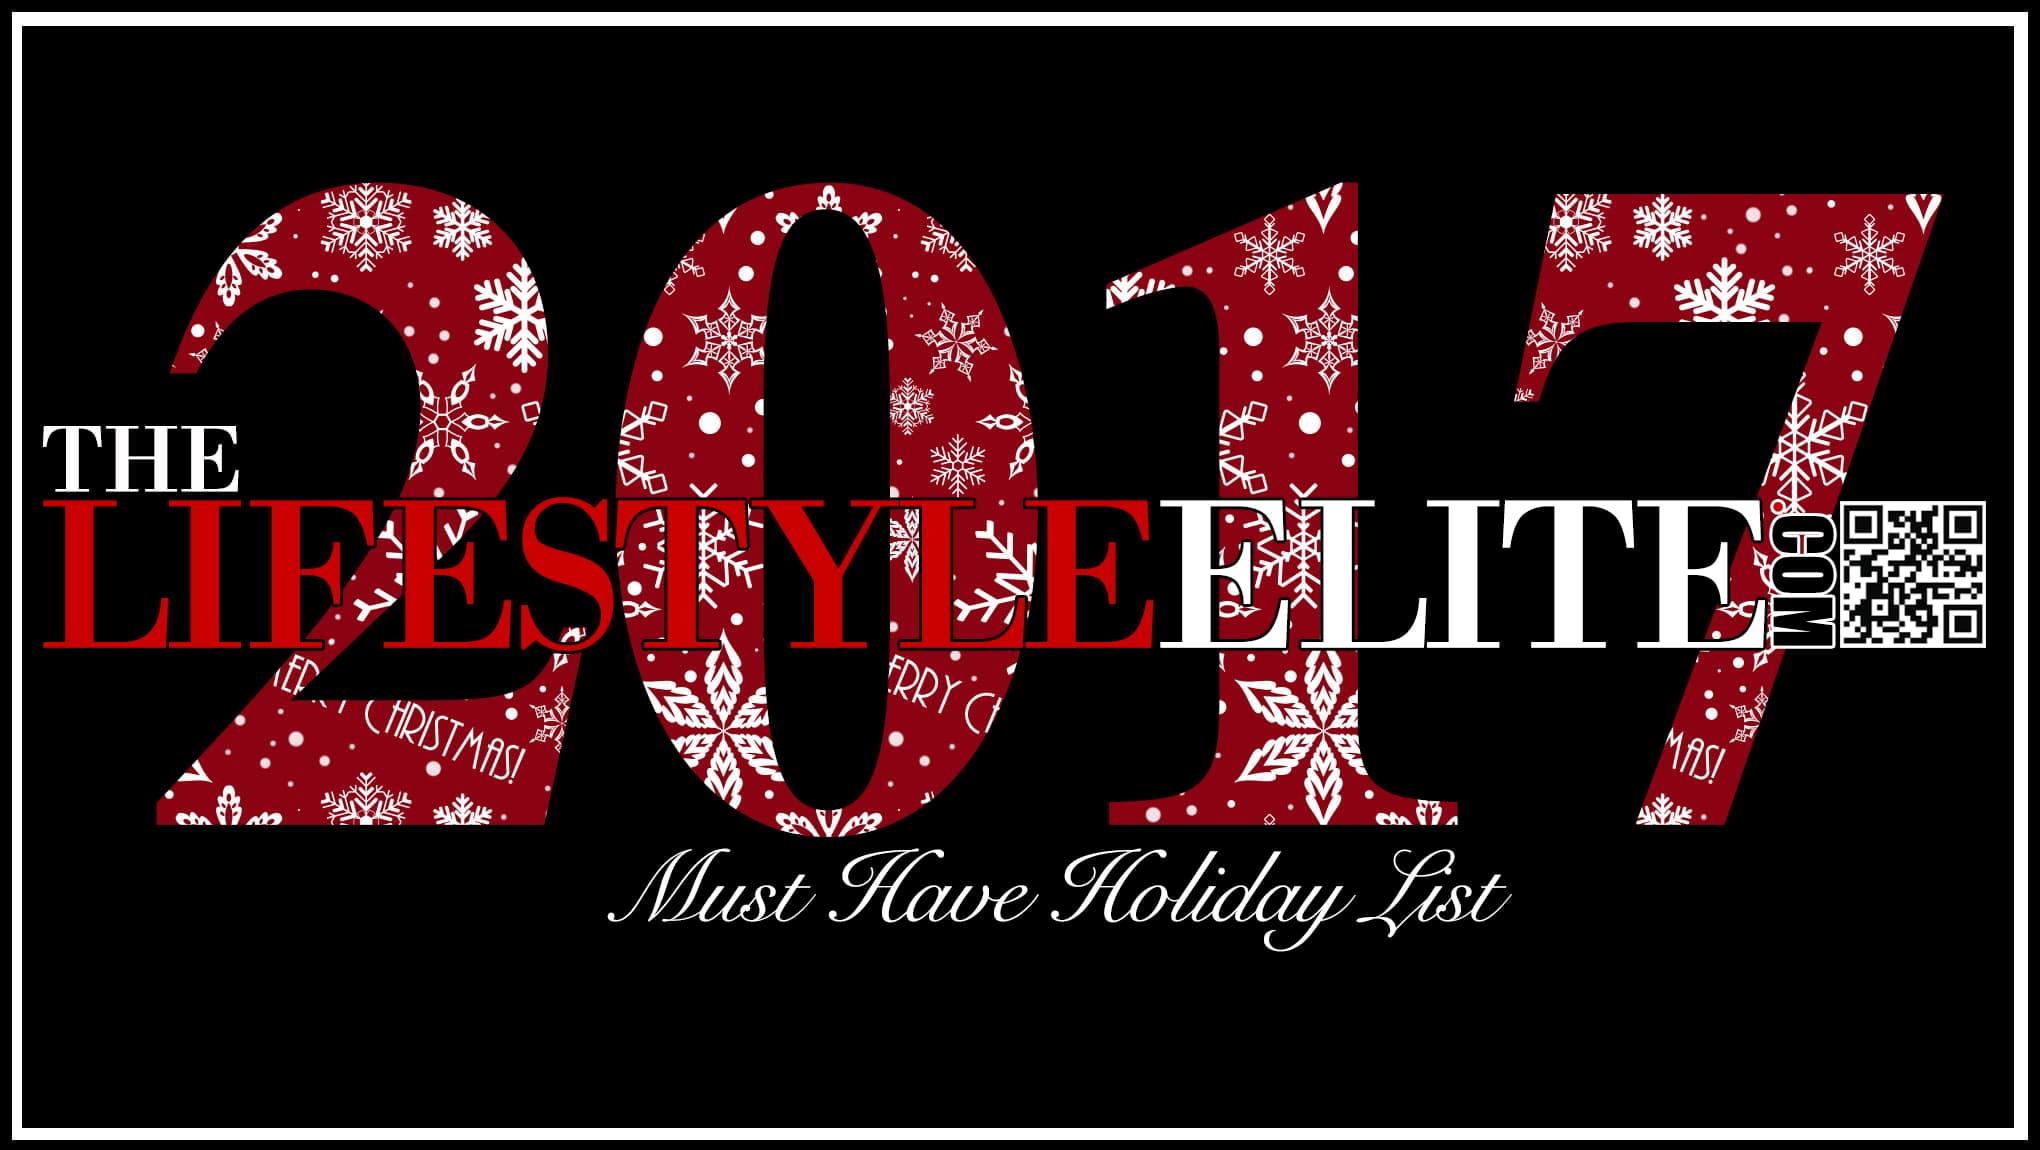 holiday gift guide,cheyan antwaune gray, cheyan gray, antwaune gray, thelifestyleelite,elite lifestyle, thelifestyleelitedotcom, thelifestyleelite.com,tlselite.com,TheLifeStyleElite.com,cheyan antwaune gray,fashion,models of thelifestyleelite.com, the life style elite,the lifestyle elite,elite lifestyle,lifestyleelite.com,cheyan gray,TLSElite,TLSElite.com,TLSEliteGaming,TLSElite Gaming